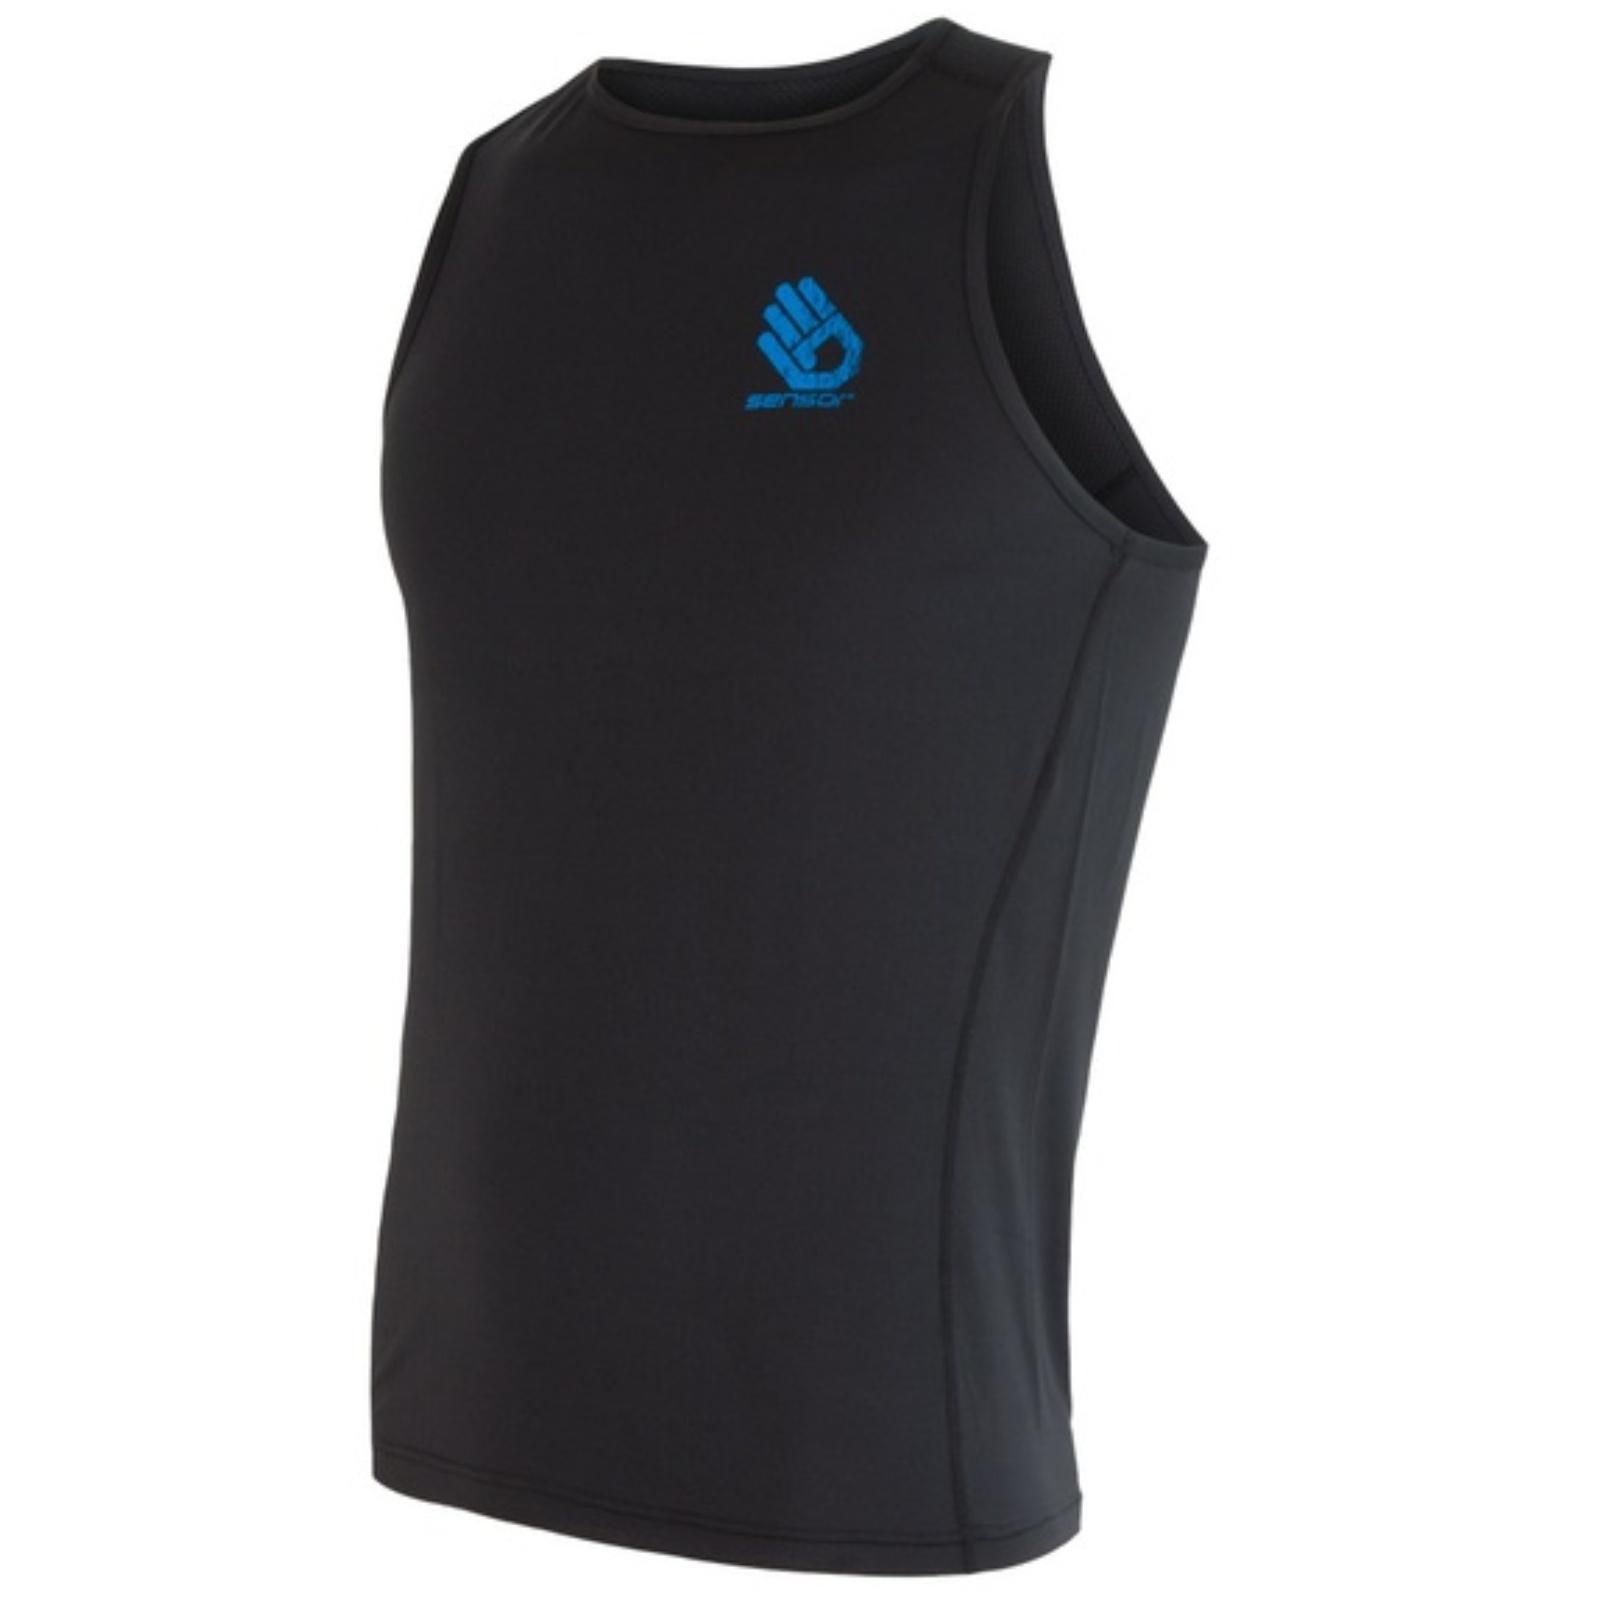 Tričko bez rukávov SENSOR Coolmax PT Ruka pán. čierne - veľ. M